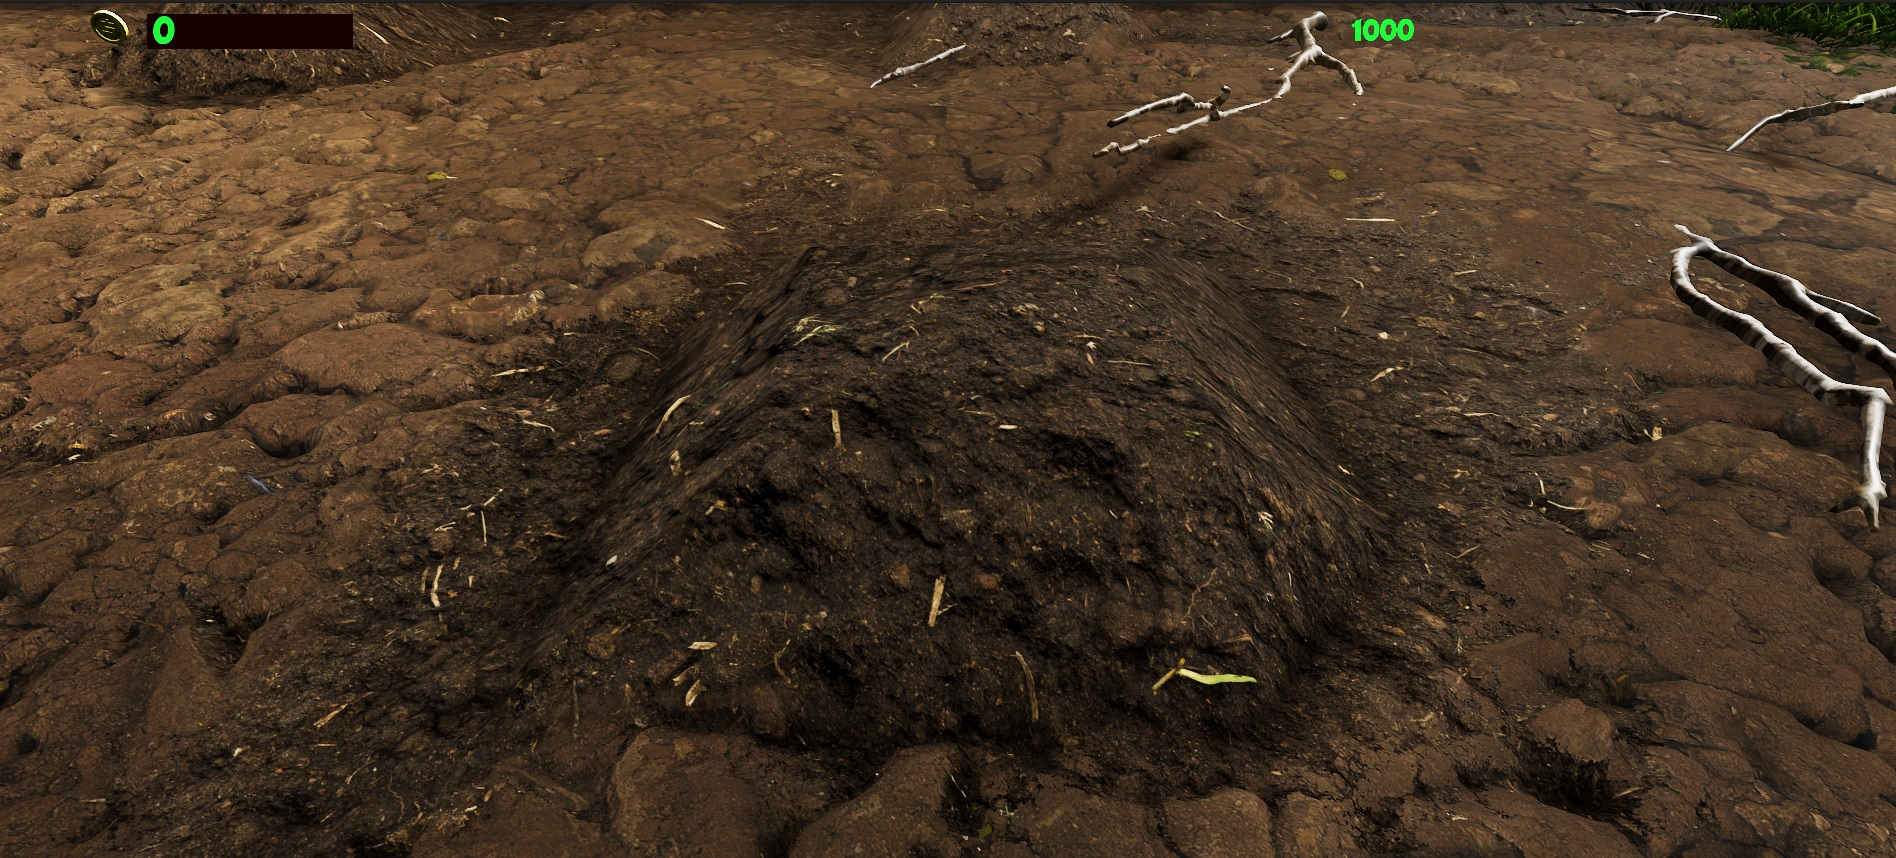 Terrain Weed Farming Game 2.jpg